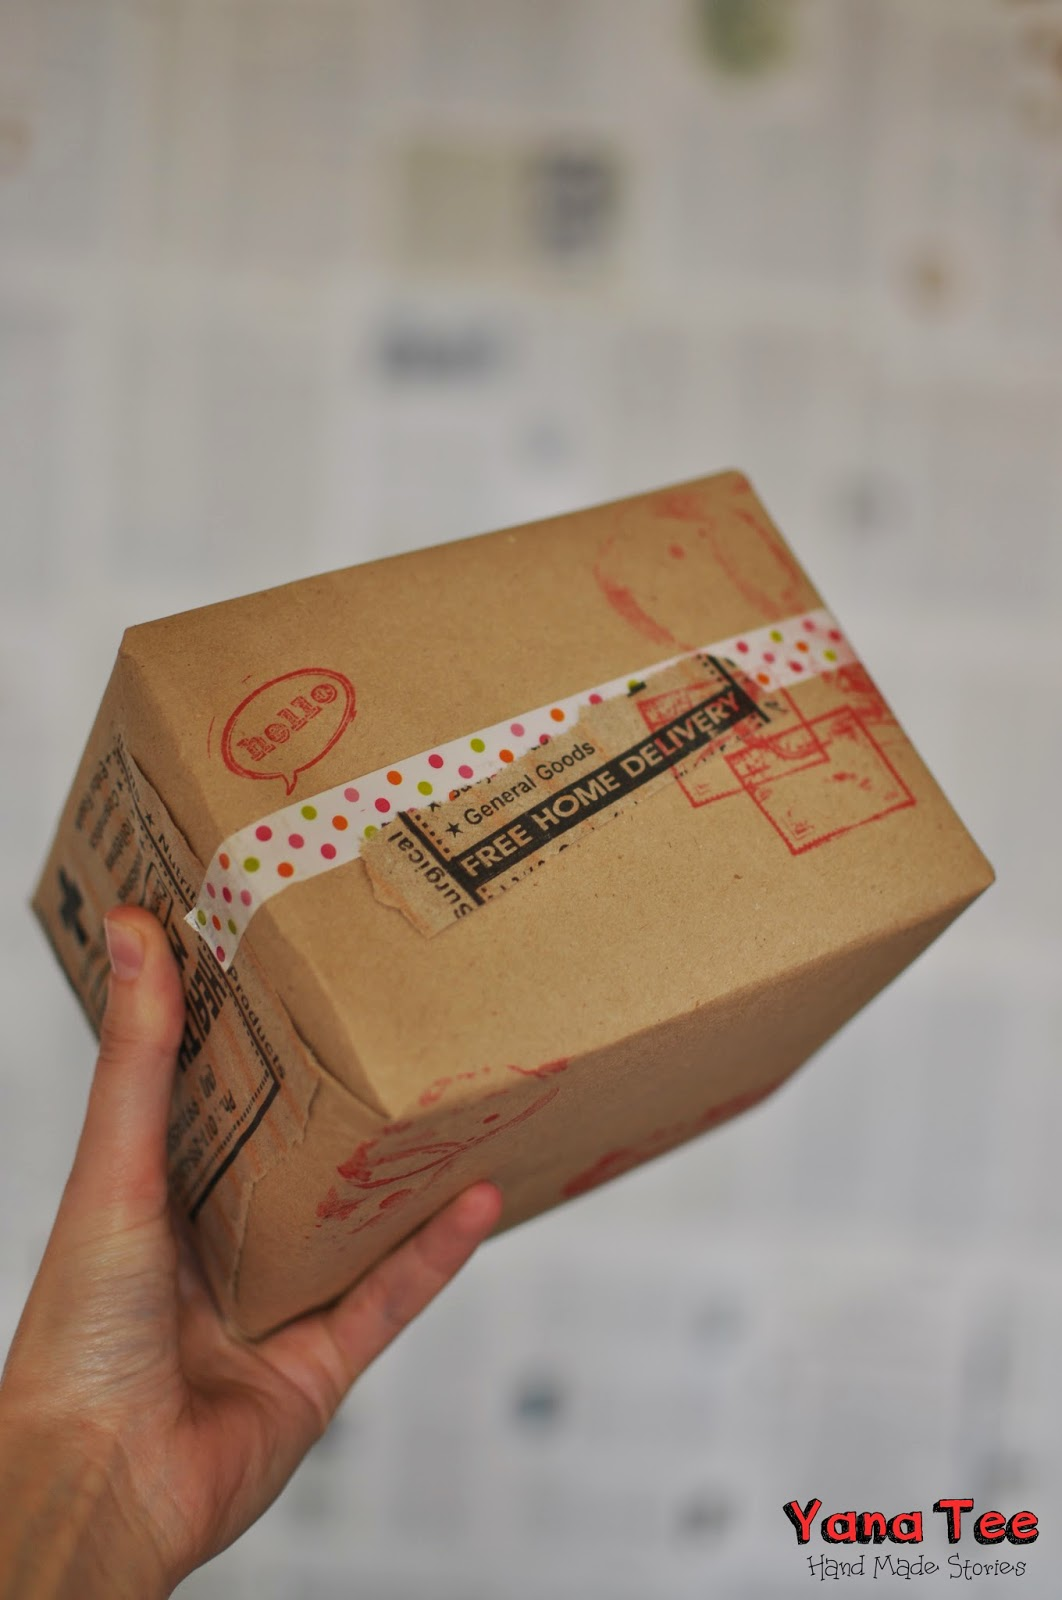 DIY, homemade, Yana tee, wrapping,  яна ти, упаковка подарков, новый год